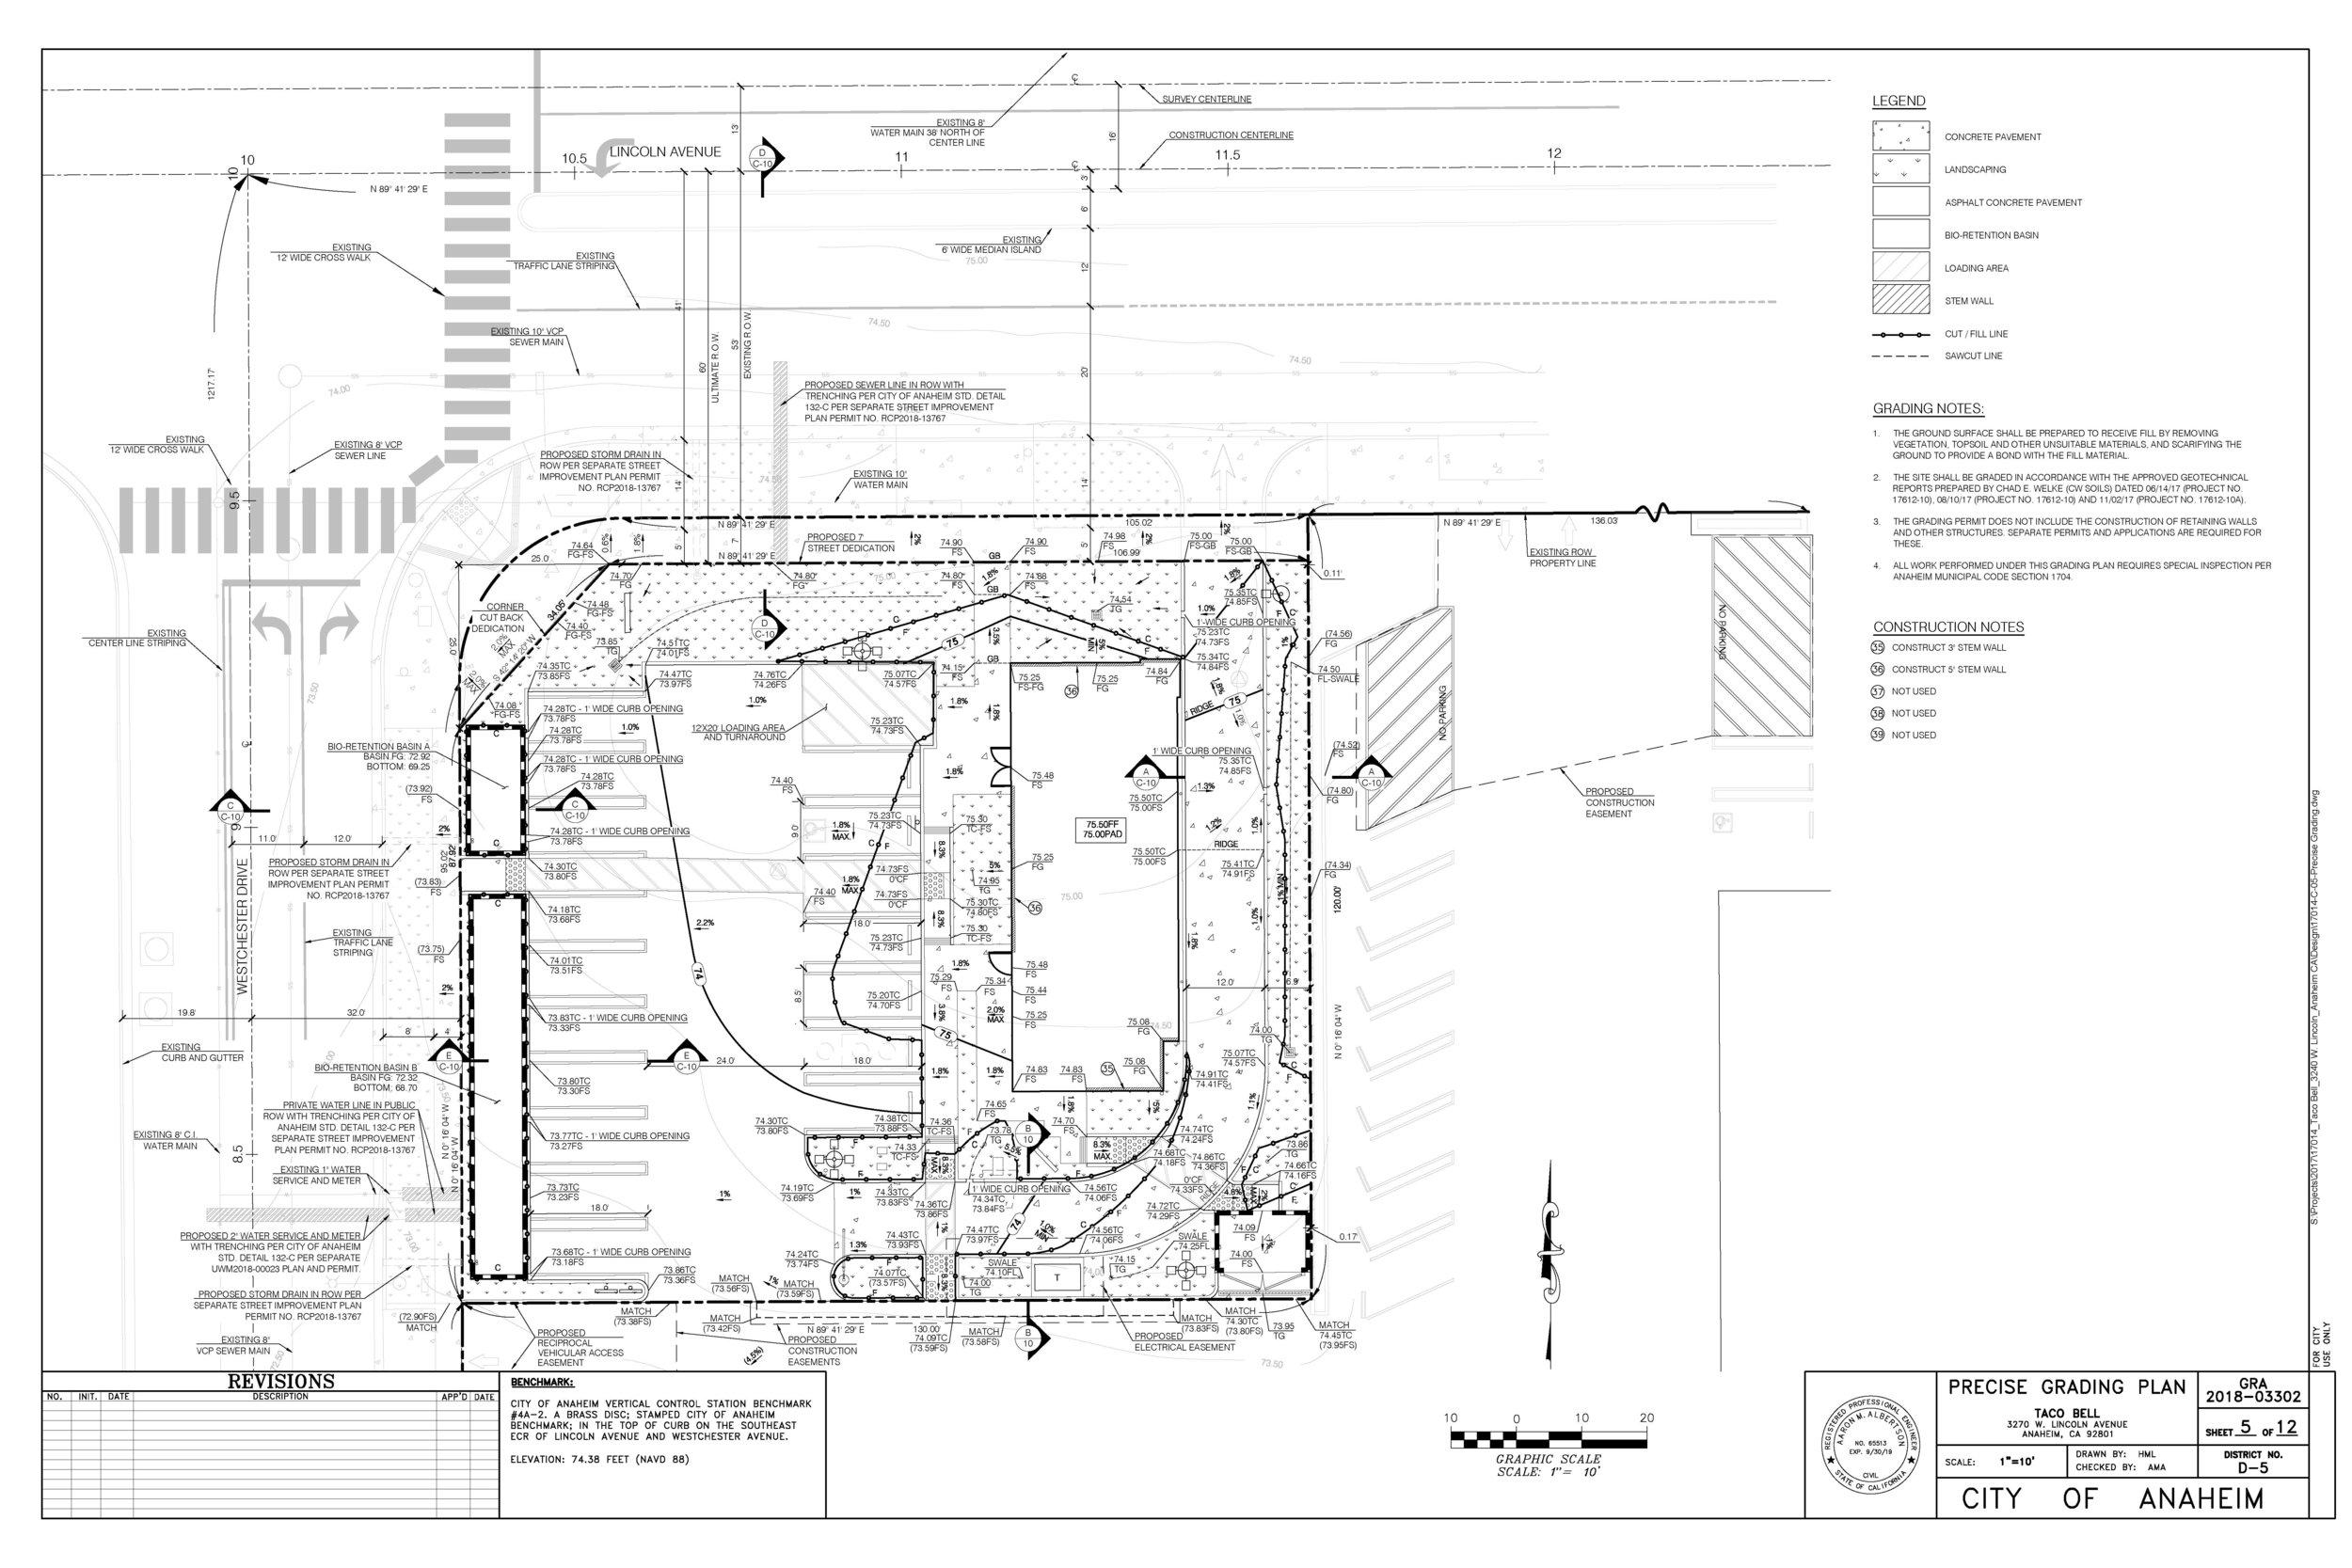 GRA2018-03302_Taco Bell Lincoln - Precise Grading Plan - 4th Sub_Page_05.jpg